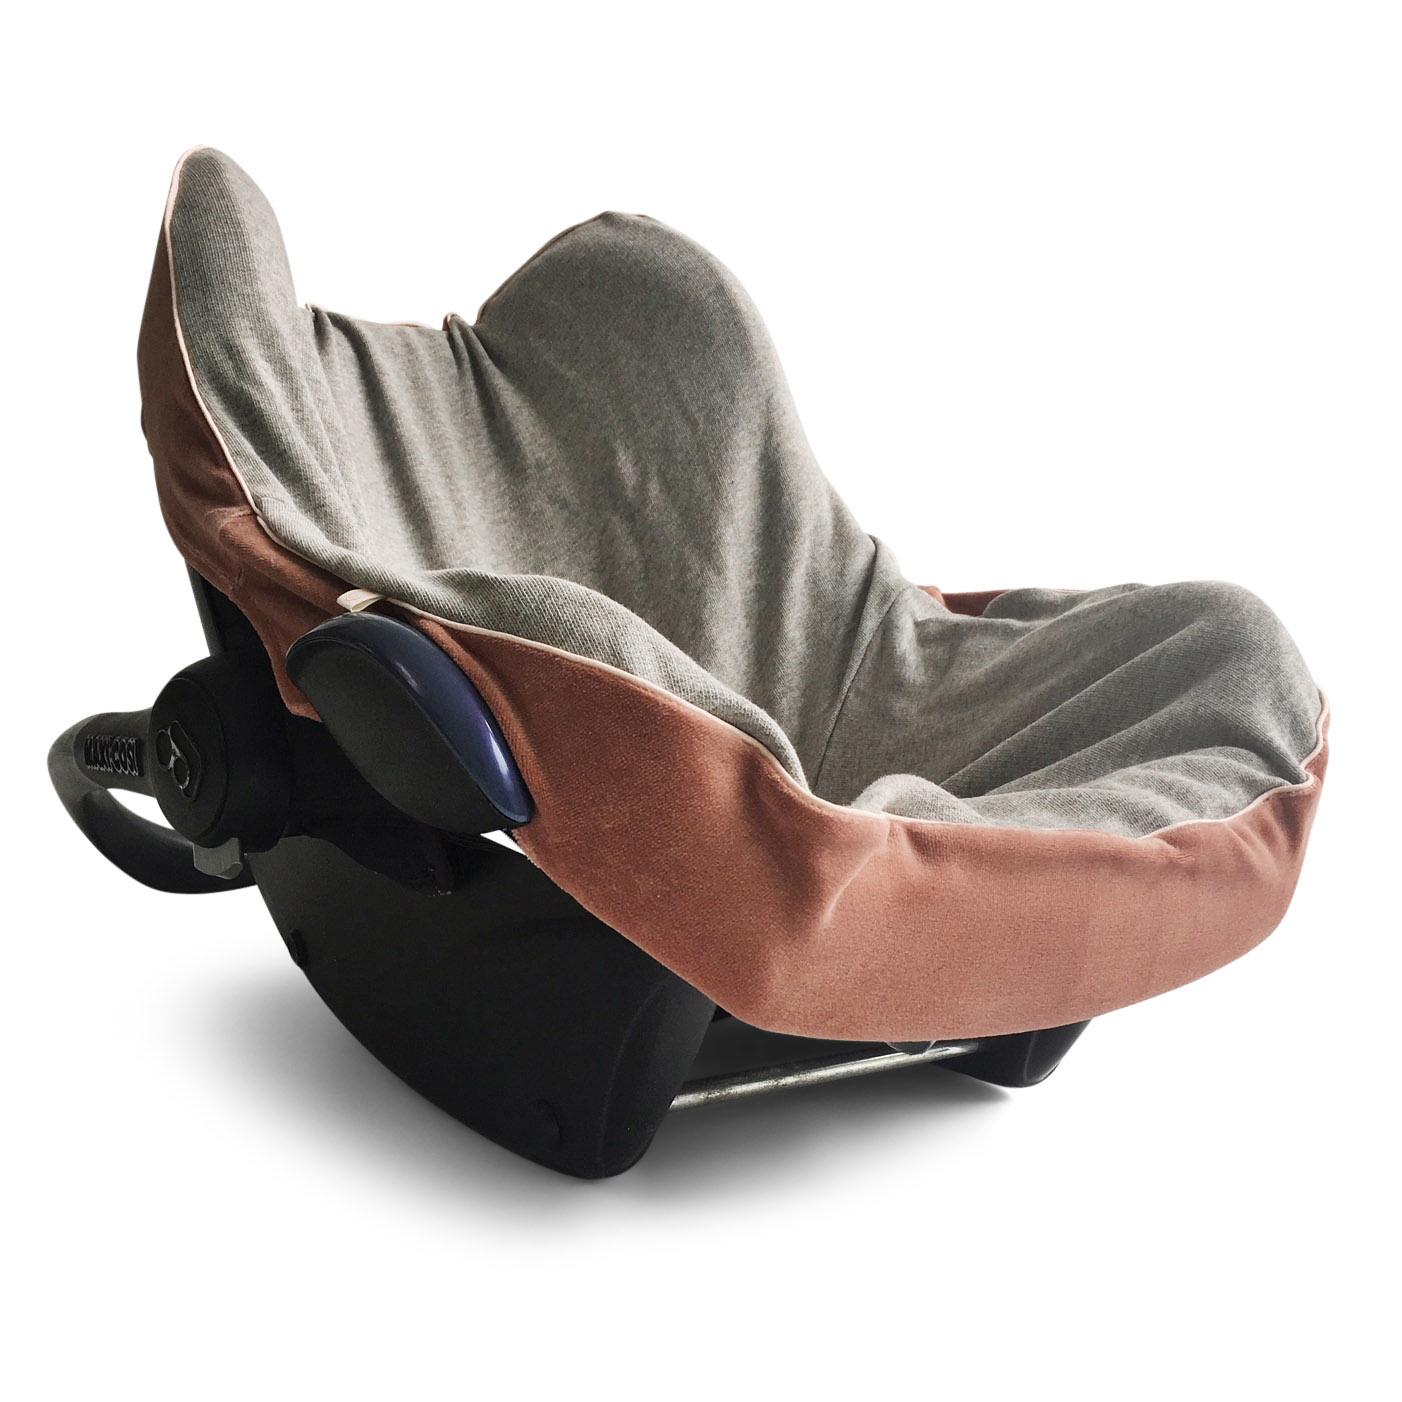 Hoes autostoel maxi cosi la croisette-2